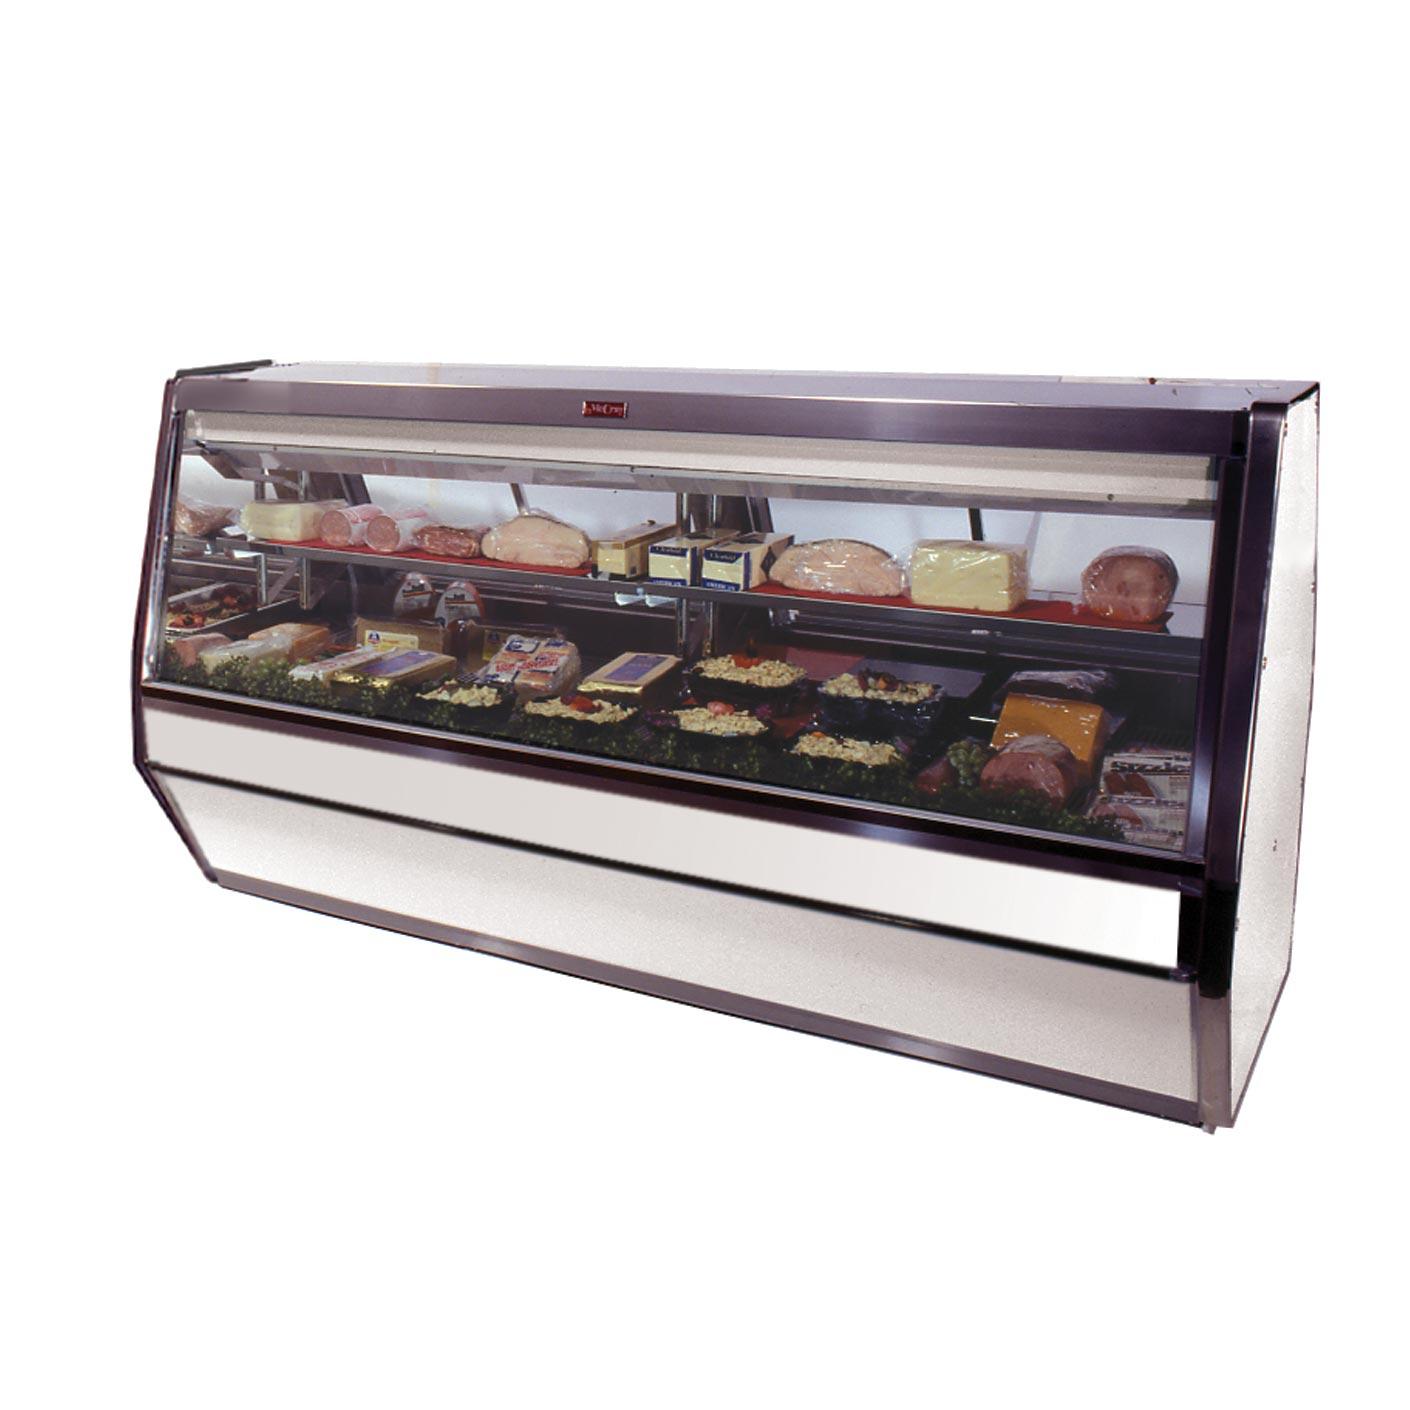 Howard-McCray SC-CDS40E-12-S-LED display case, refrigerated deli